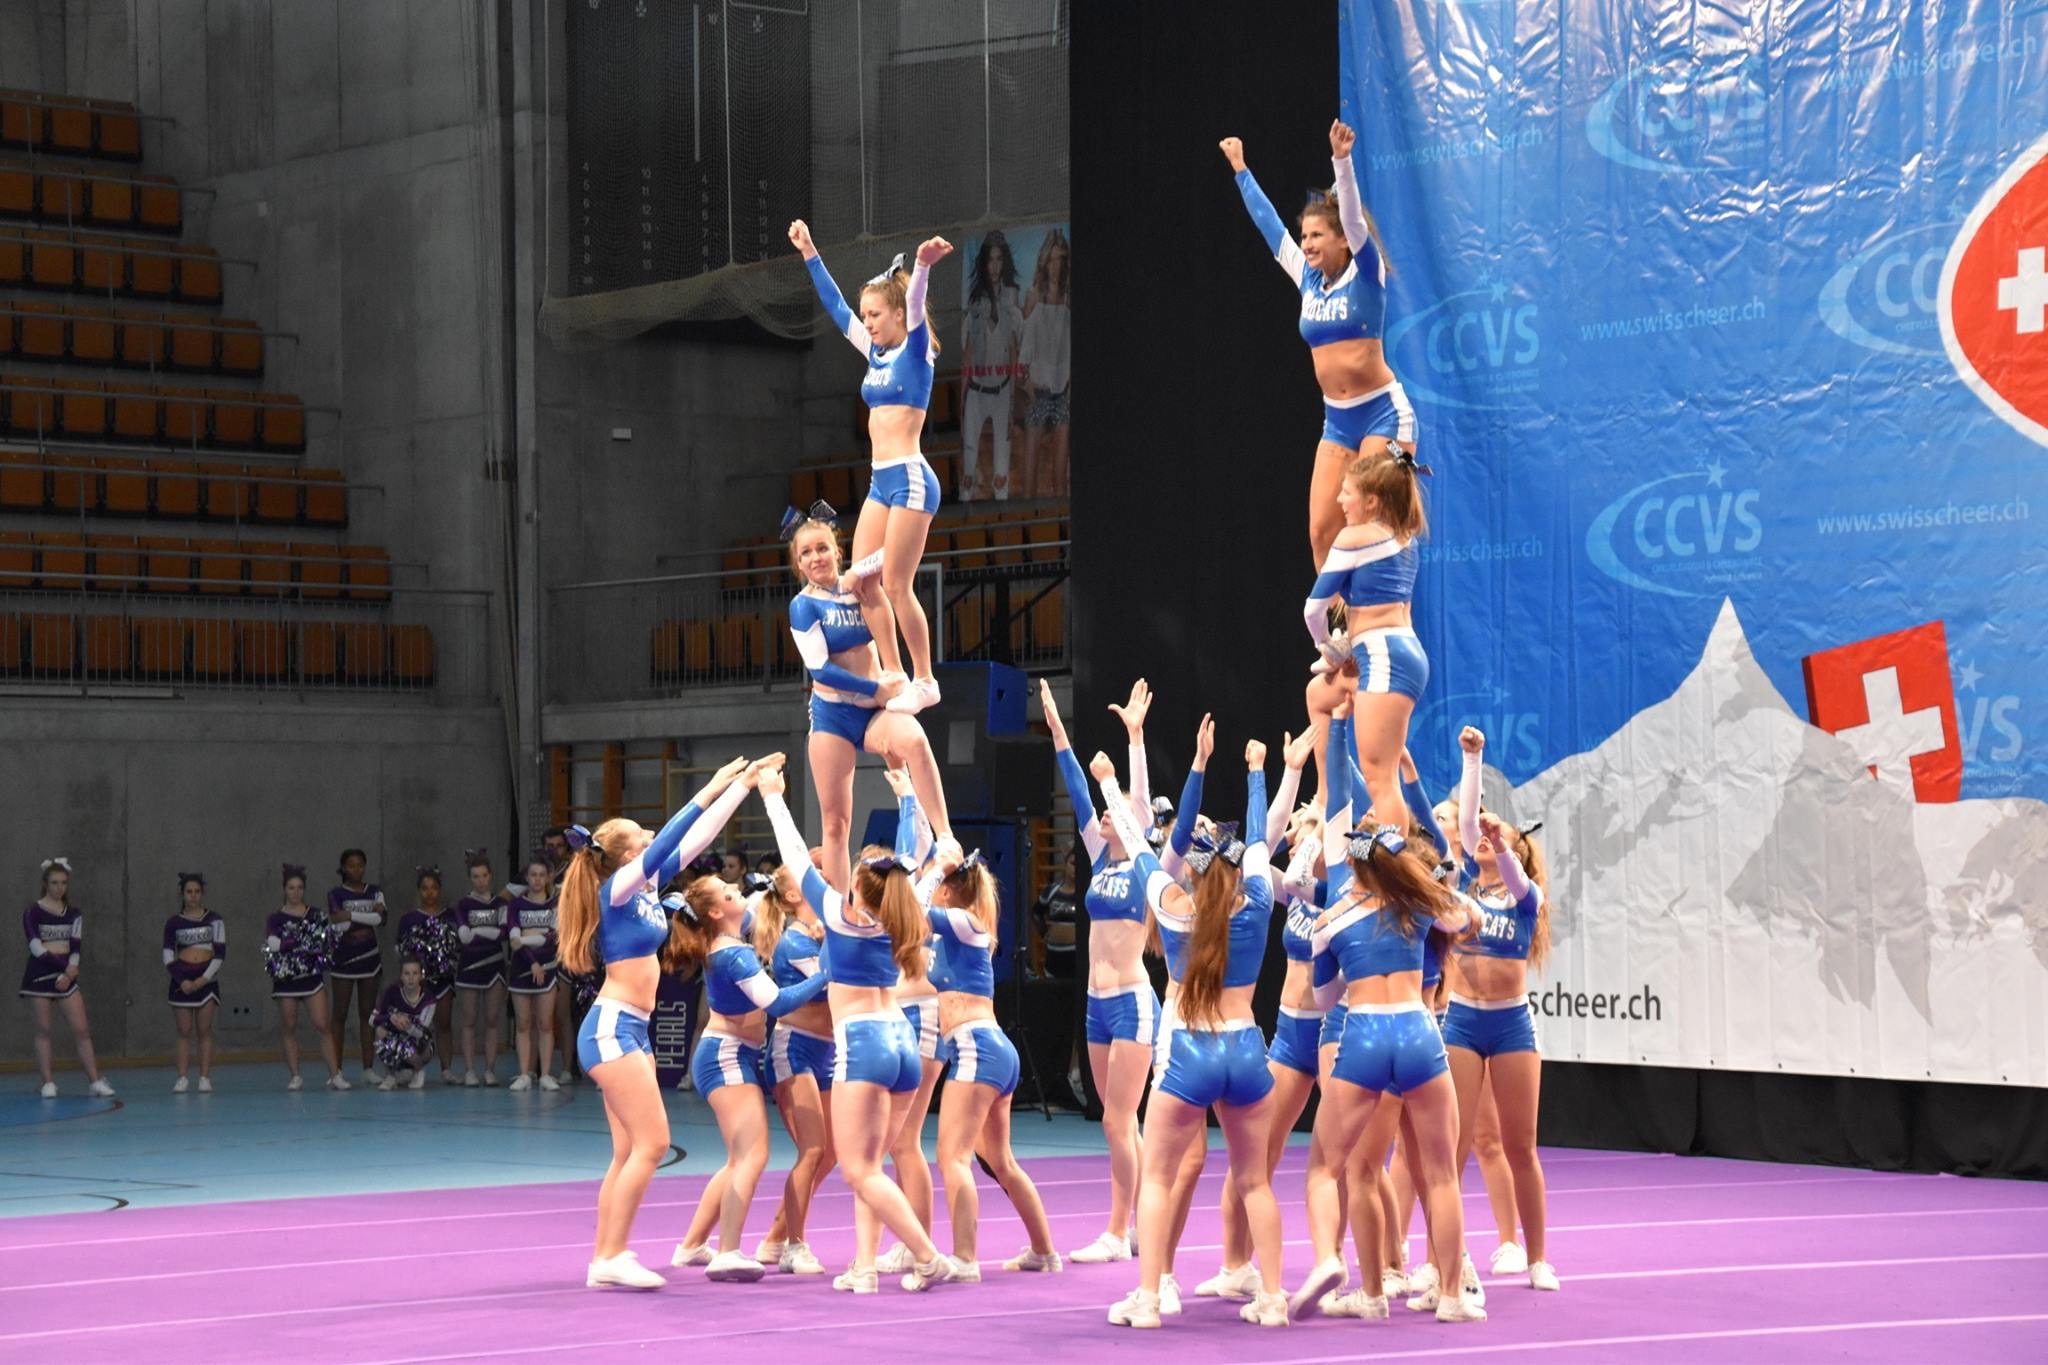 Luzern Wildcats Season 5 15/16